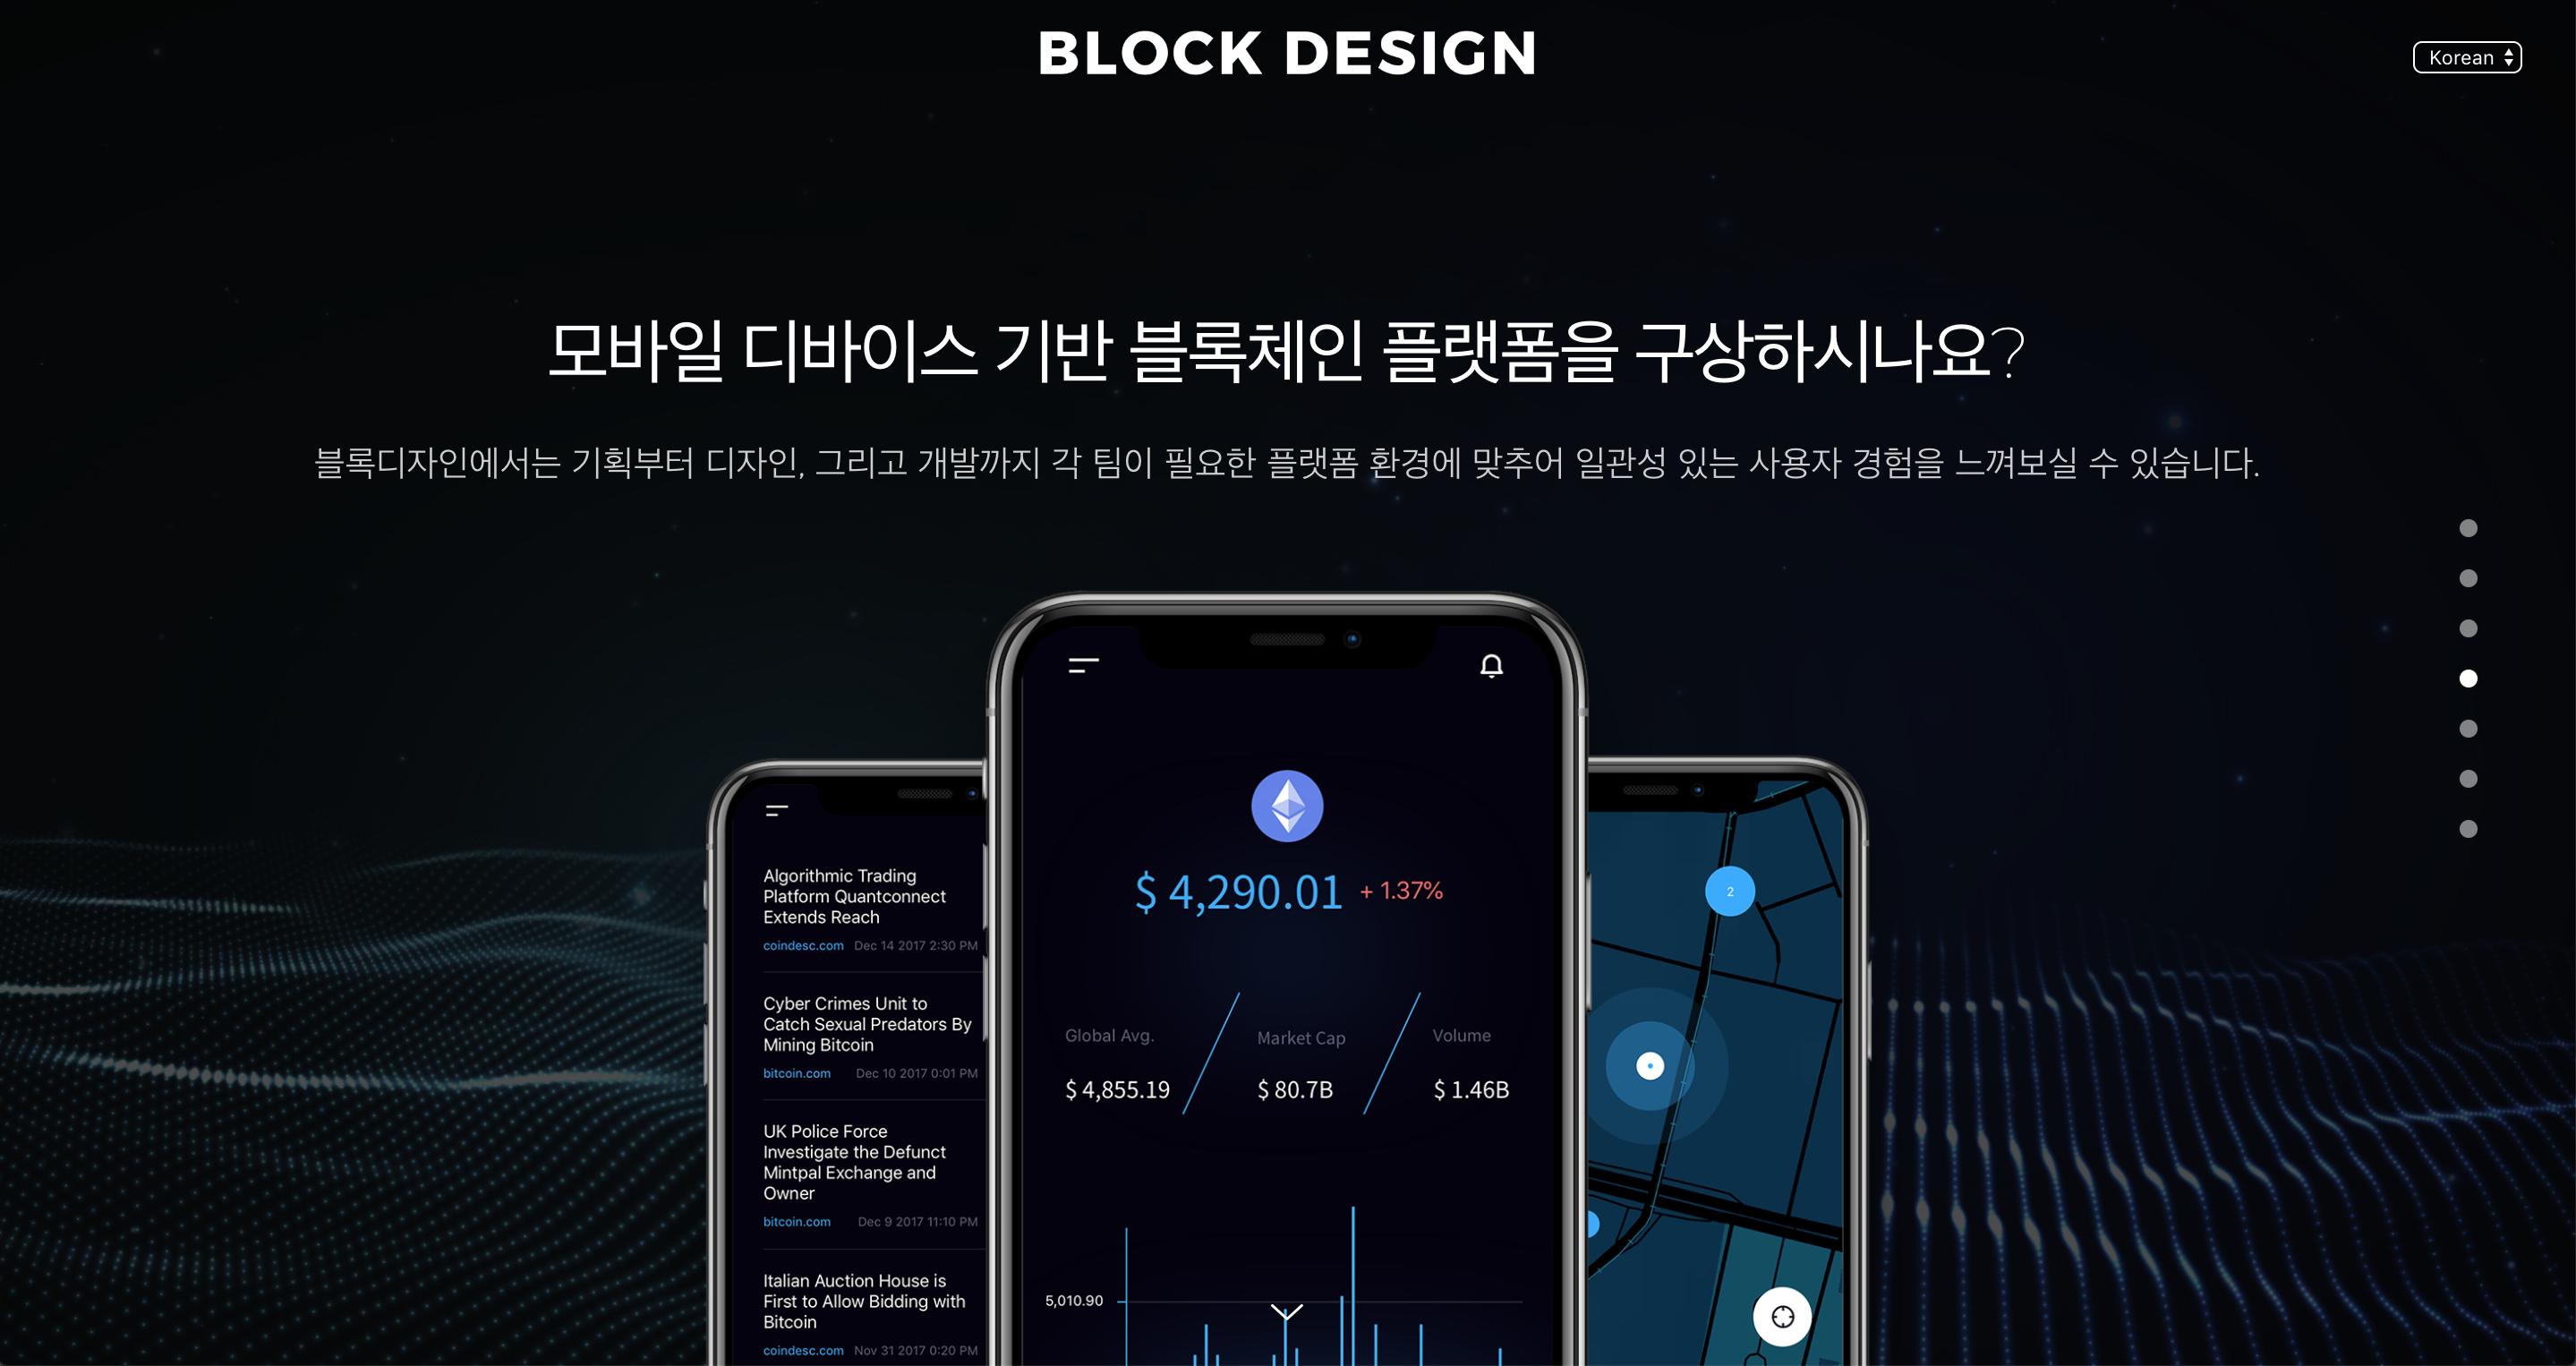 Screenshot 2019-01-10 15.39.05.png